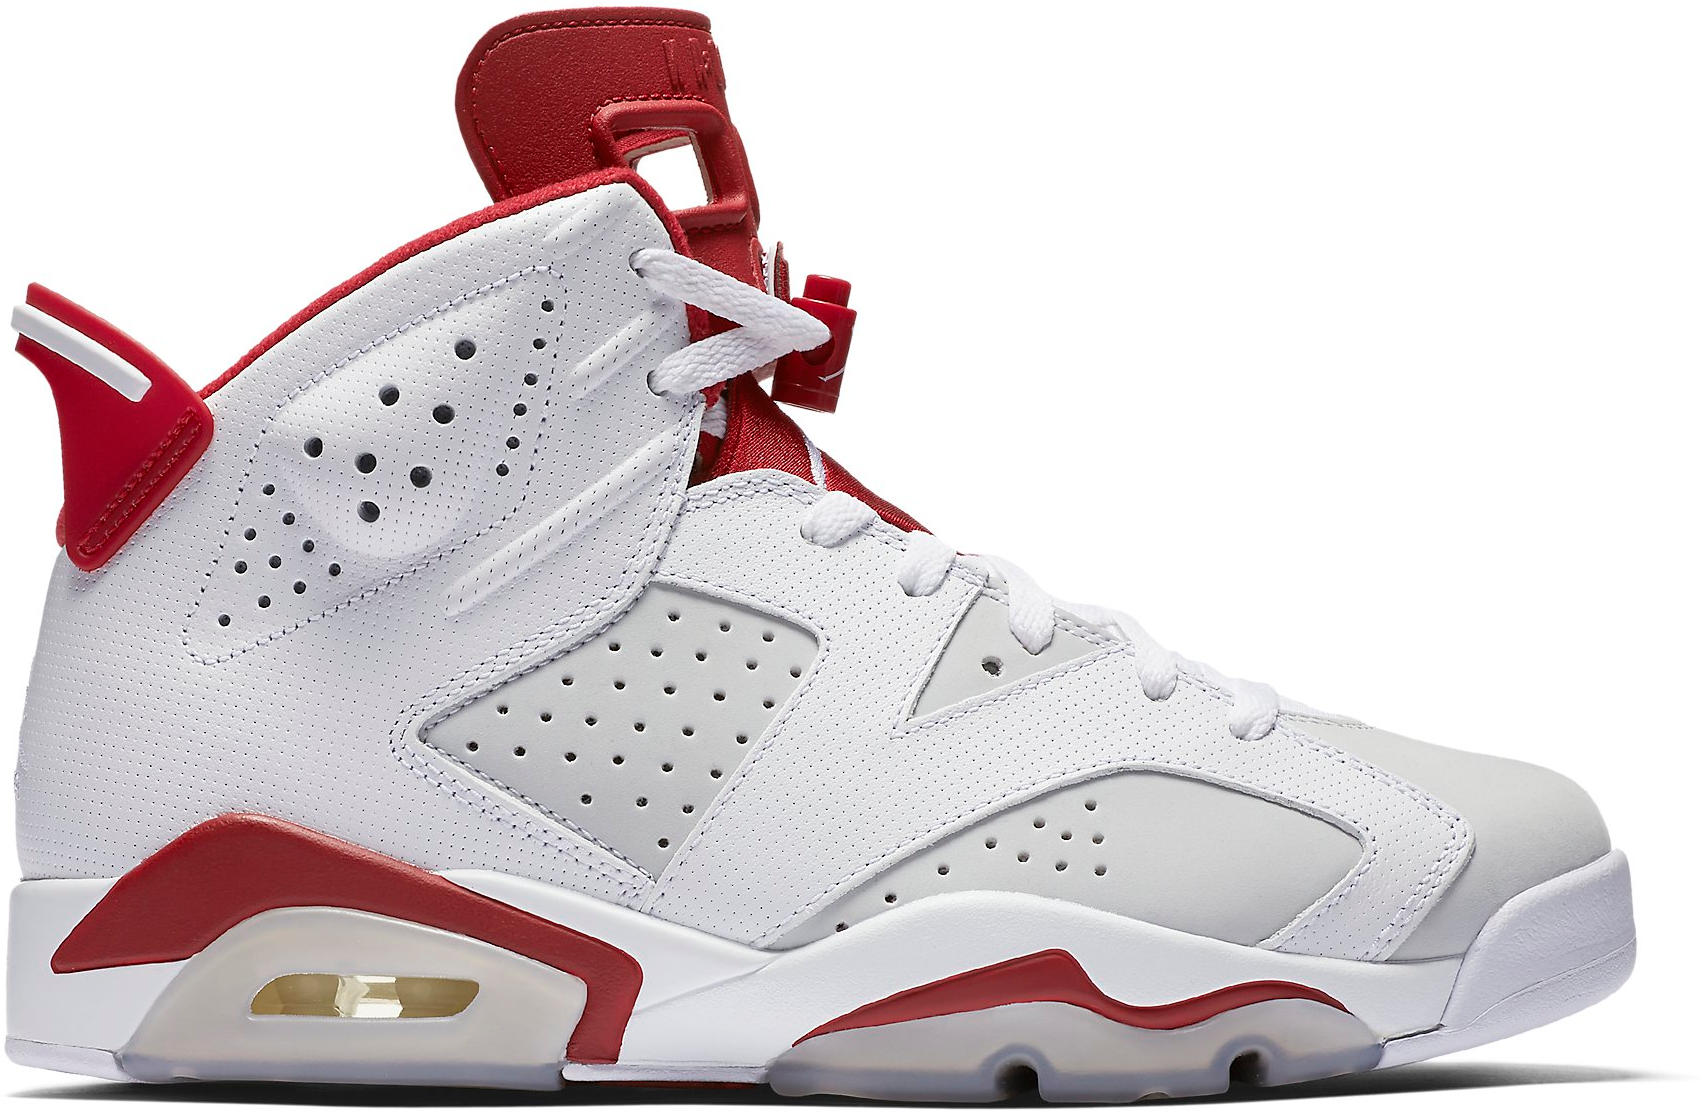 Air Jordan 6 Retro 'Alternate' - 384664-113 - Size 16 -